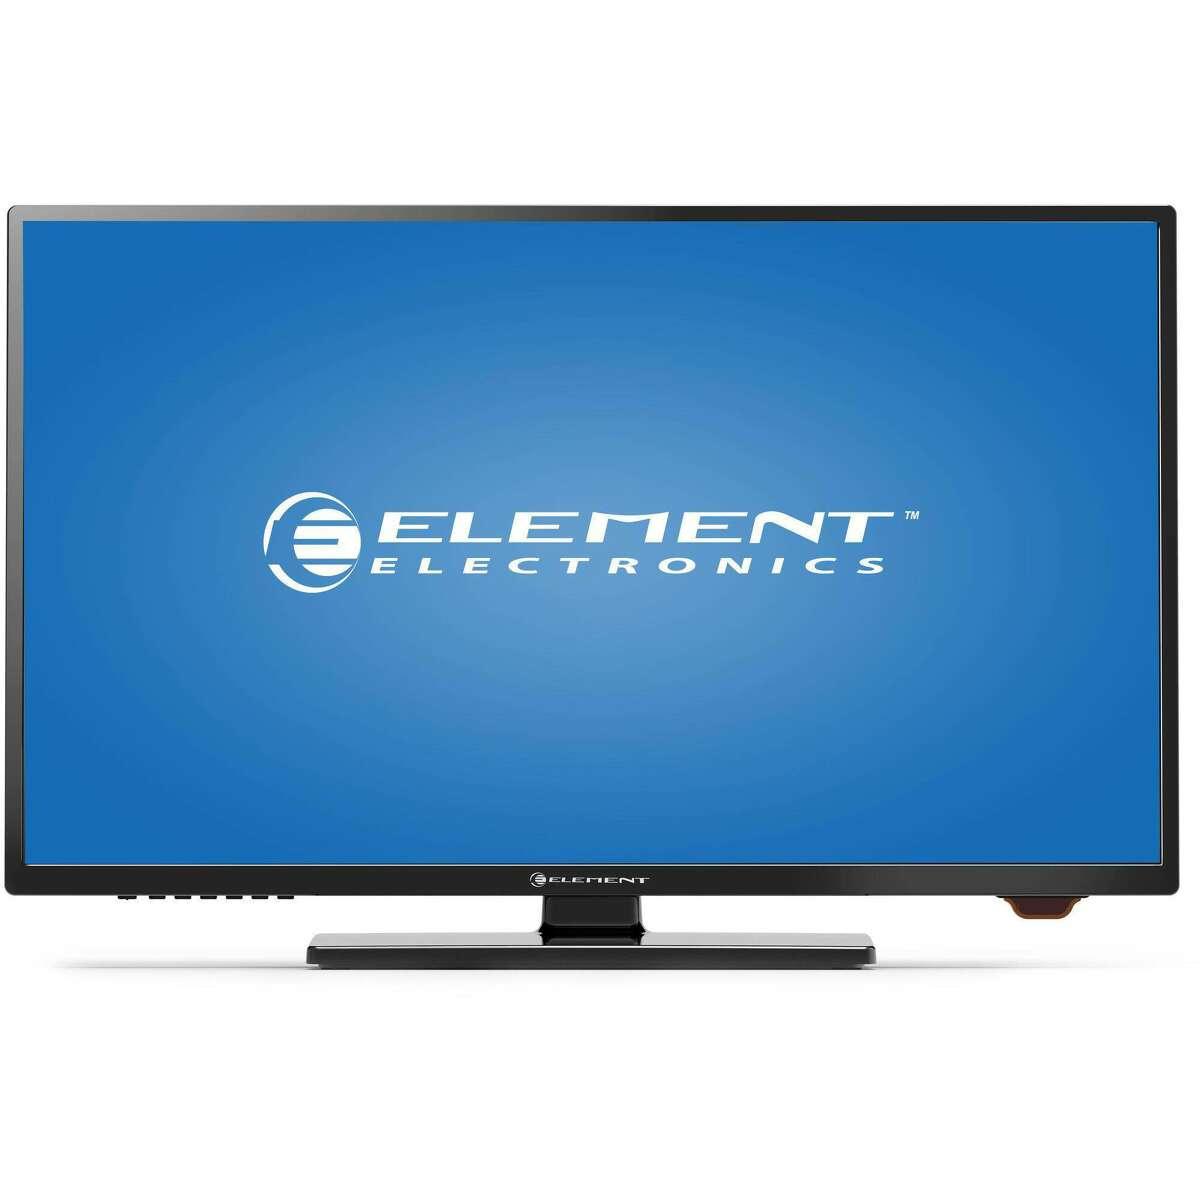 Element 39-inch Smart TV